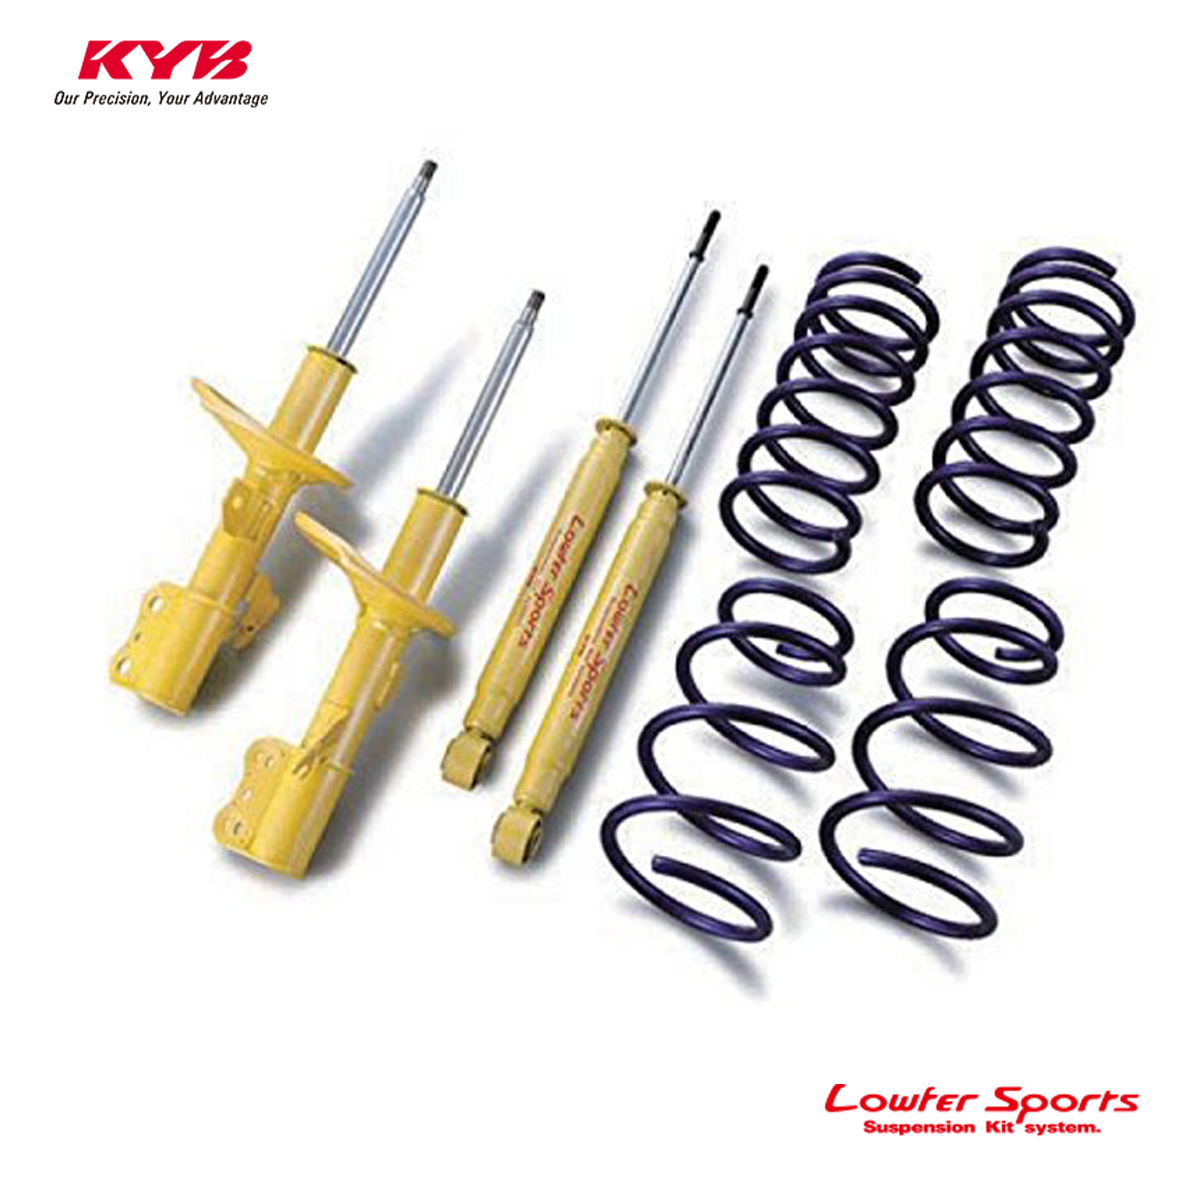 KYB カヤバ オデッセイ RA2 ショックアブソーバー サスペンションキット Lowfer Sports LKIT-RA4 配送先条件有り